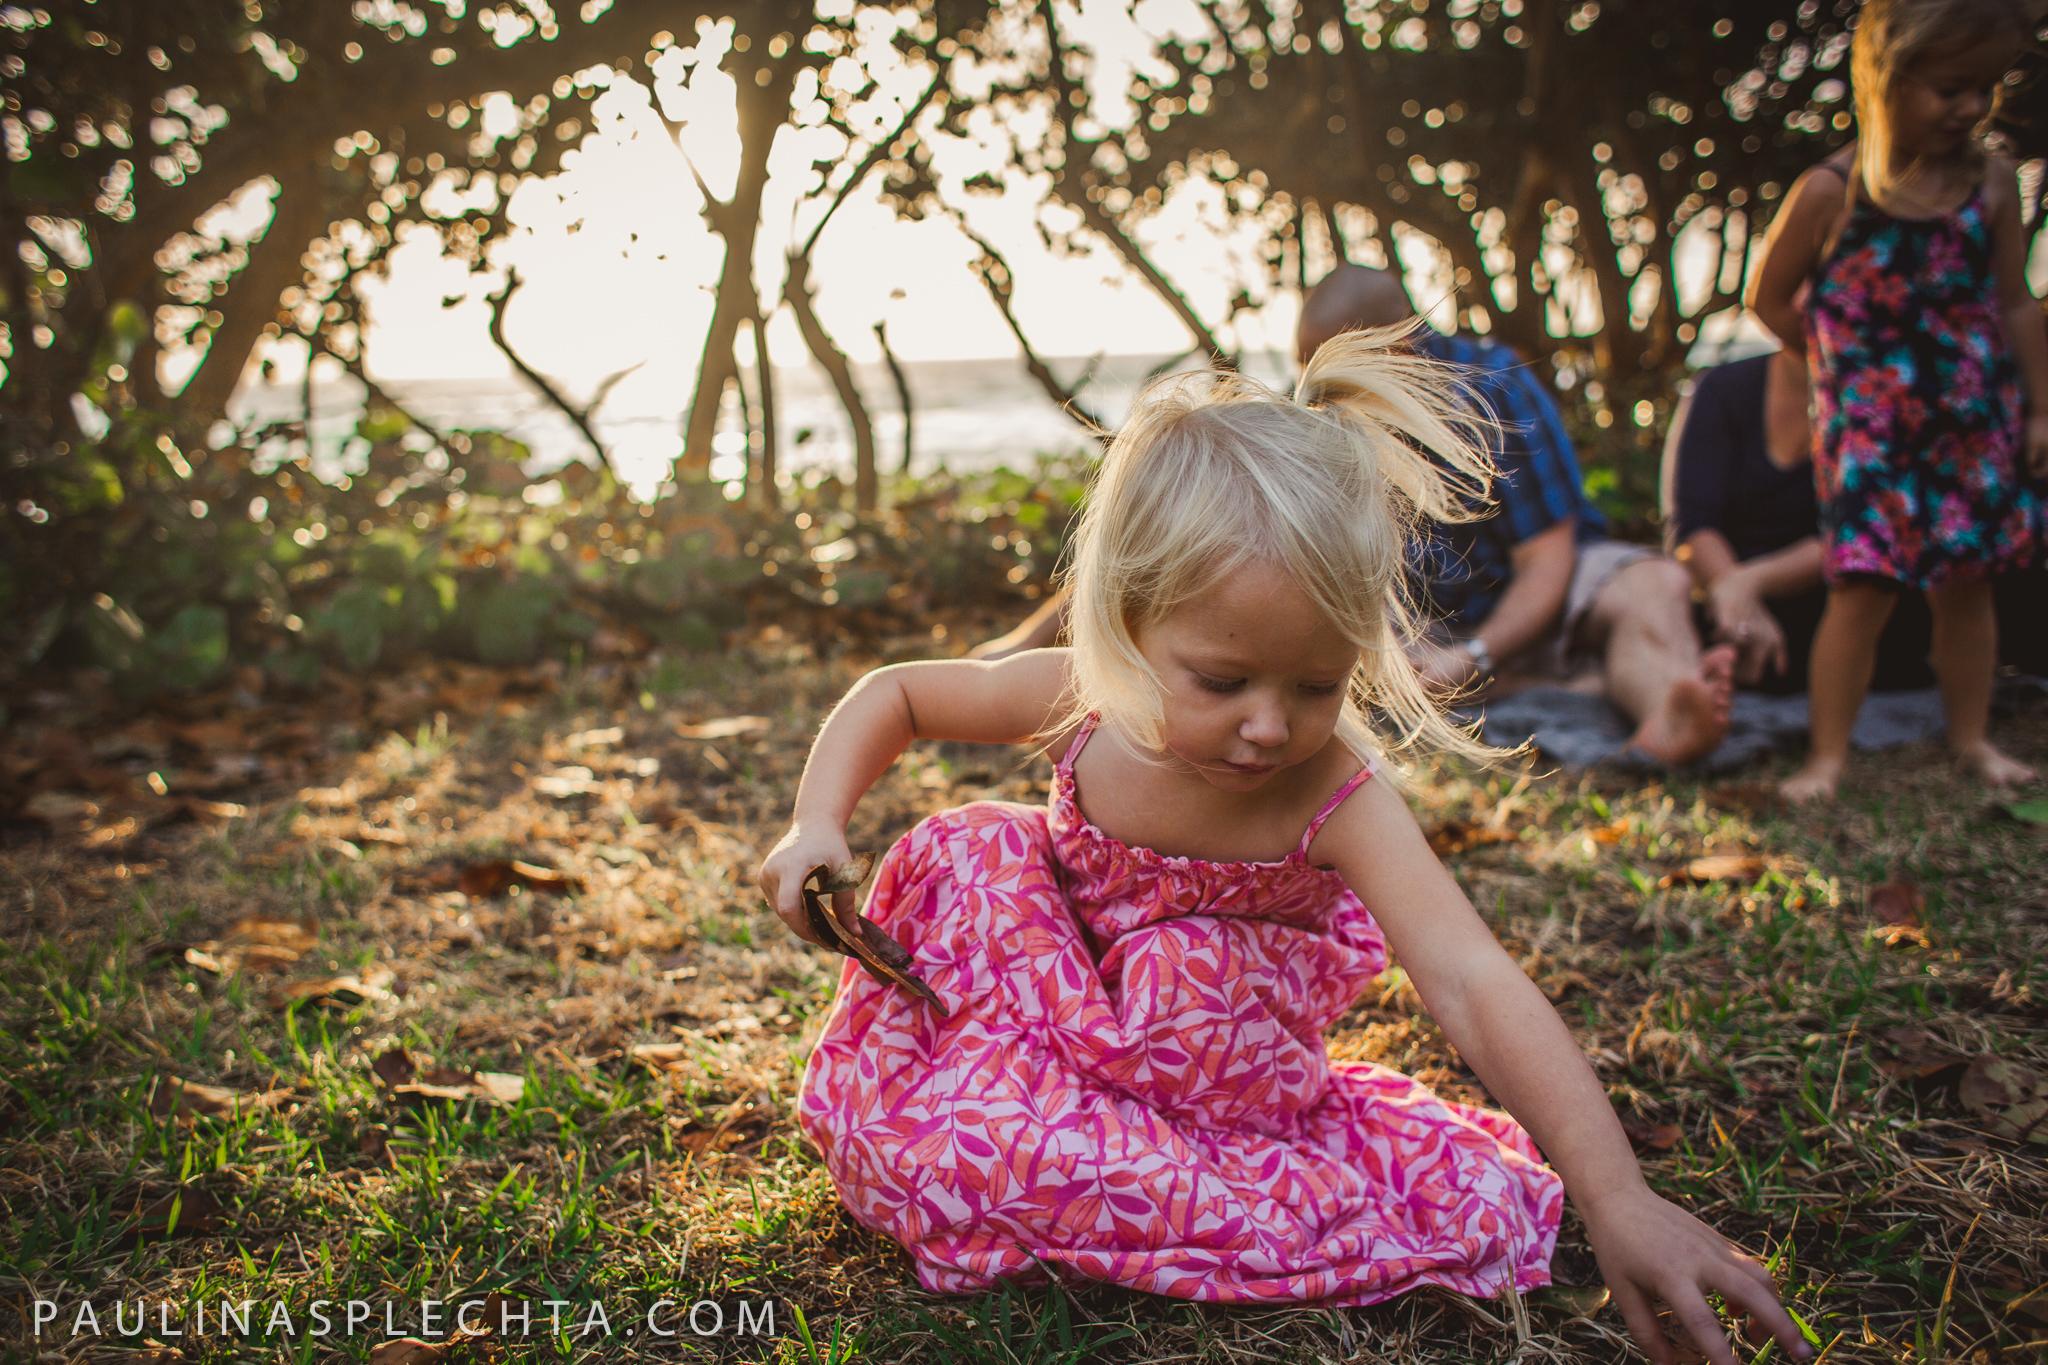 Family Photographer South Florida Pompano Broward Palm Beach Babies Baby Newborn Breastfeeding Birth Photograpy Beach Home Documentary Session-91.jpg